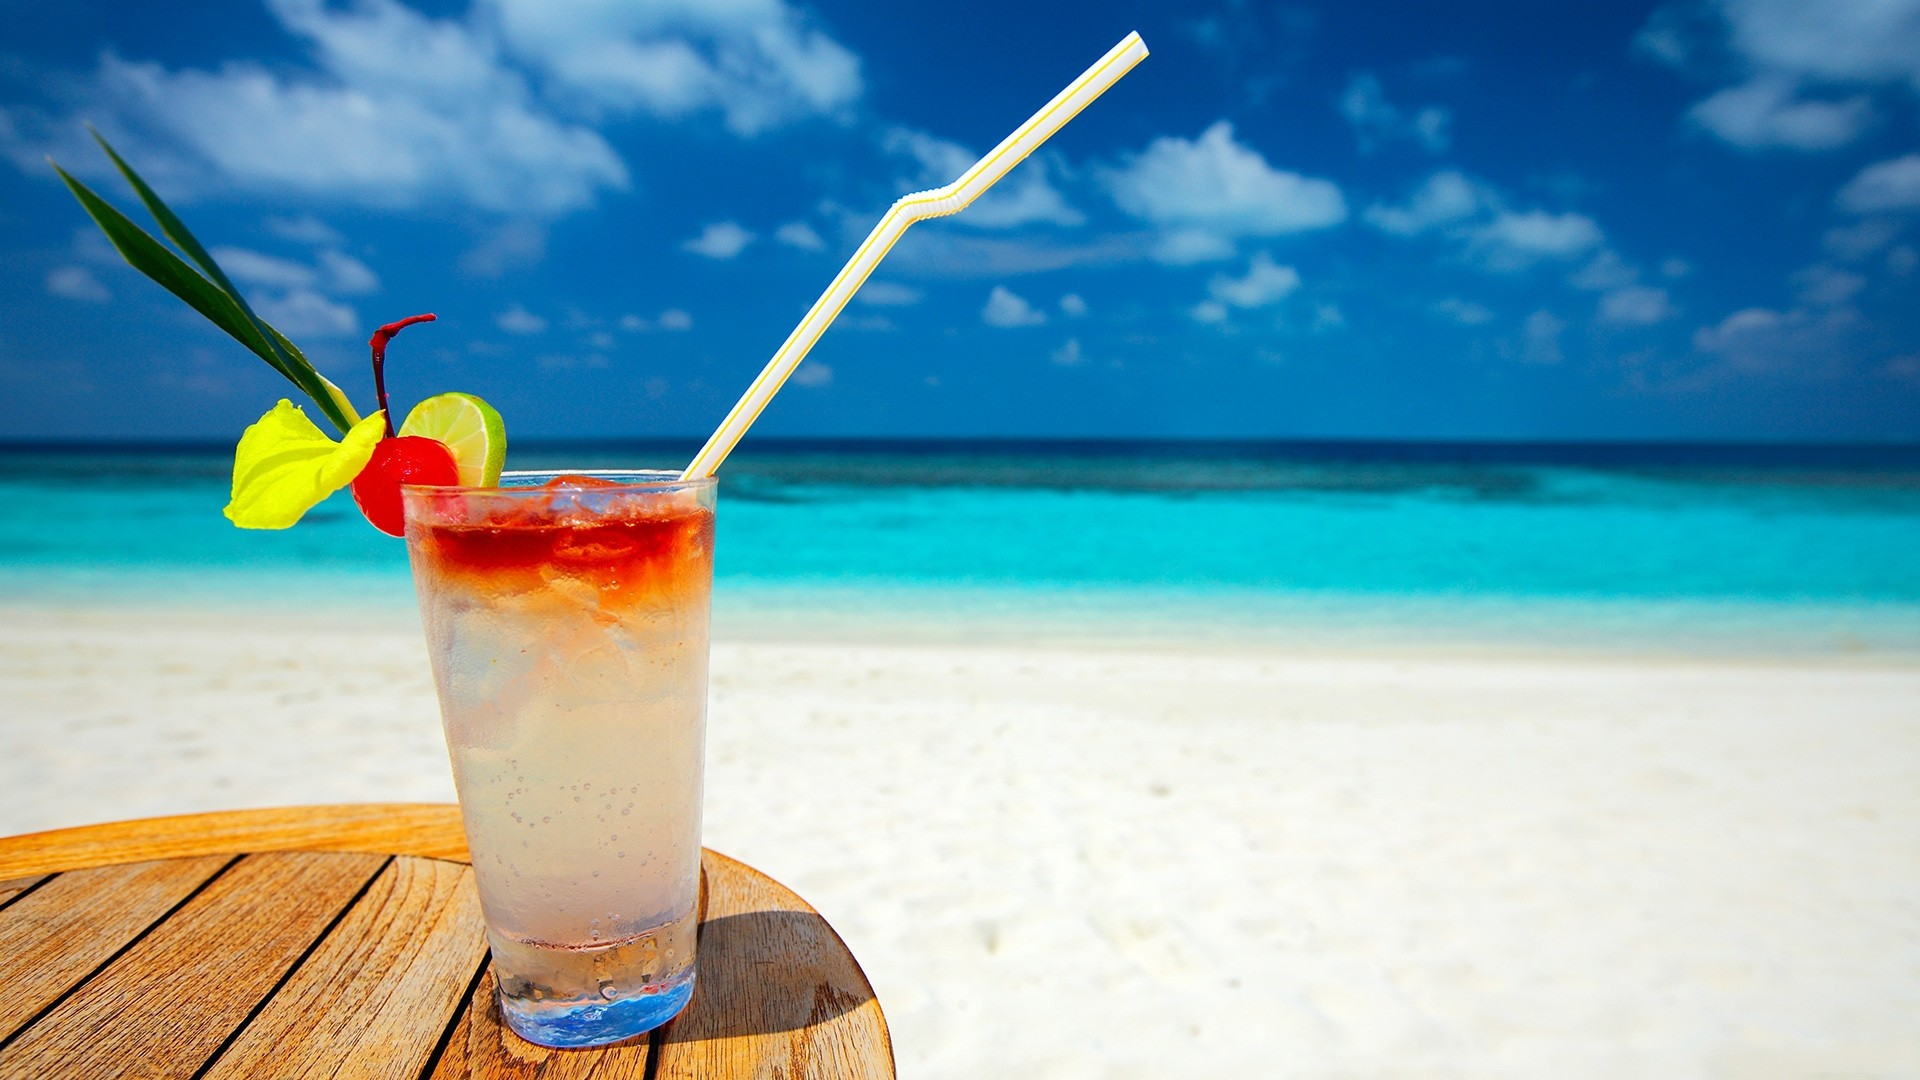 Photo of tropical beaches screensavers High Resolution Wallpaper 1920x1080